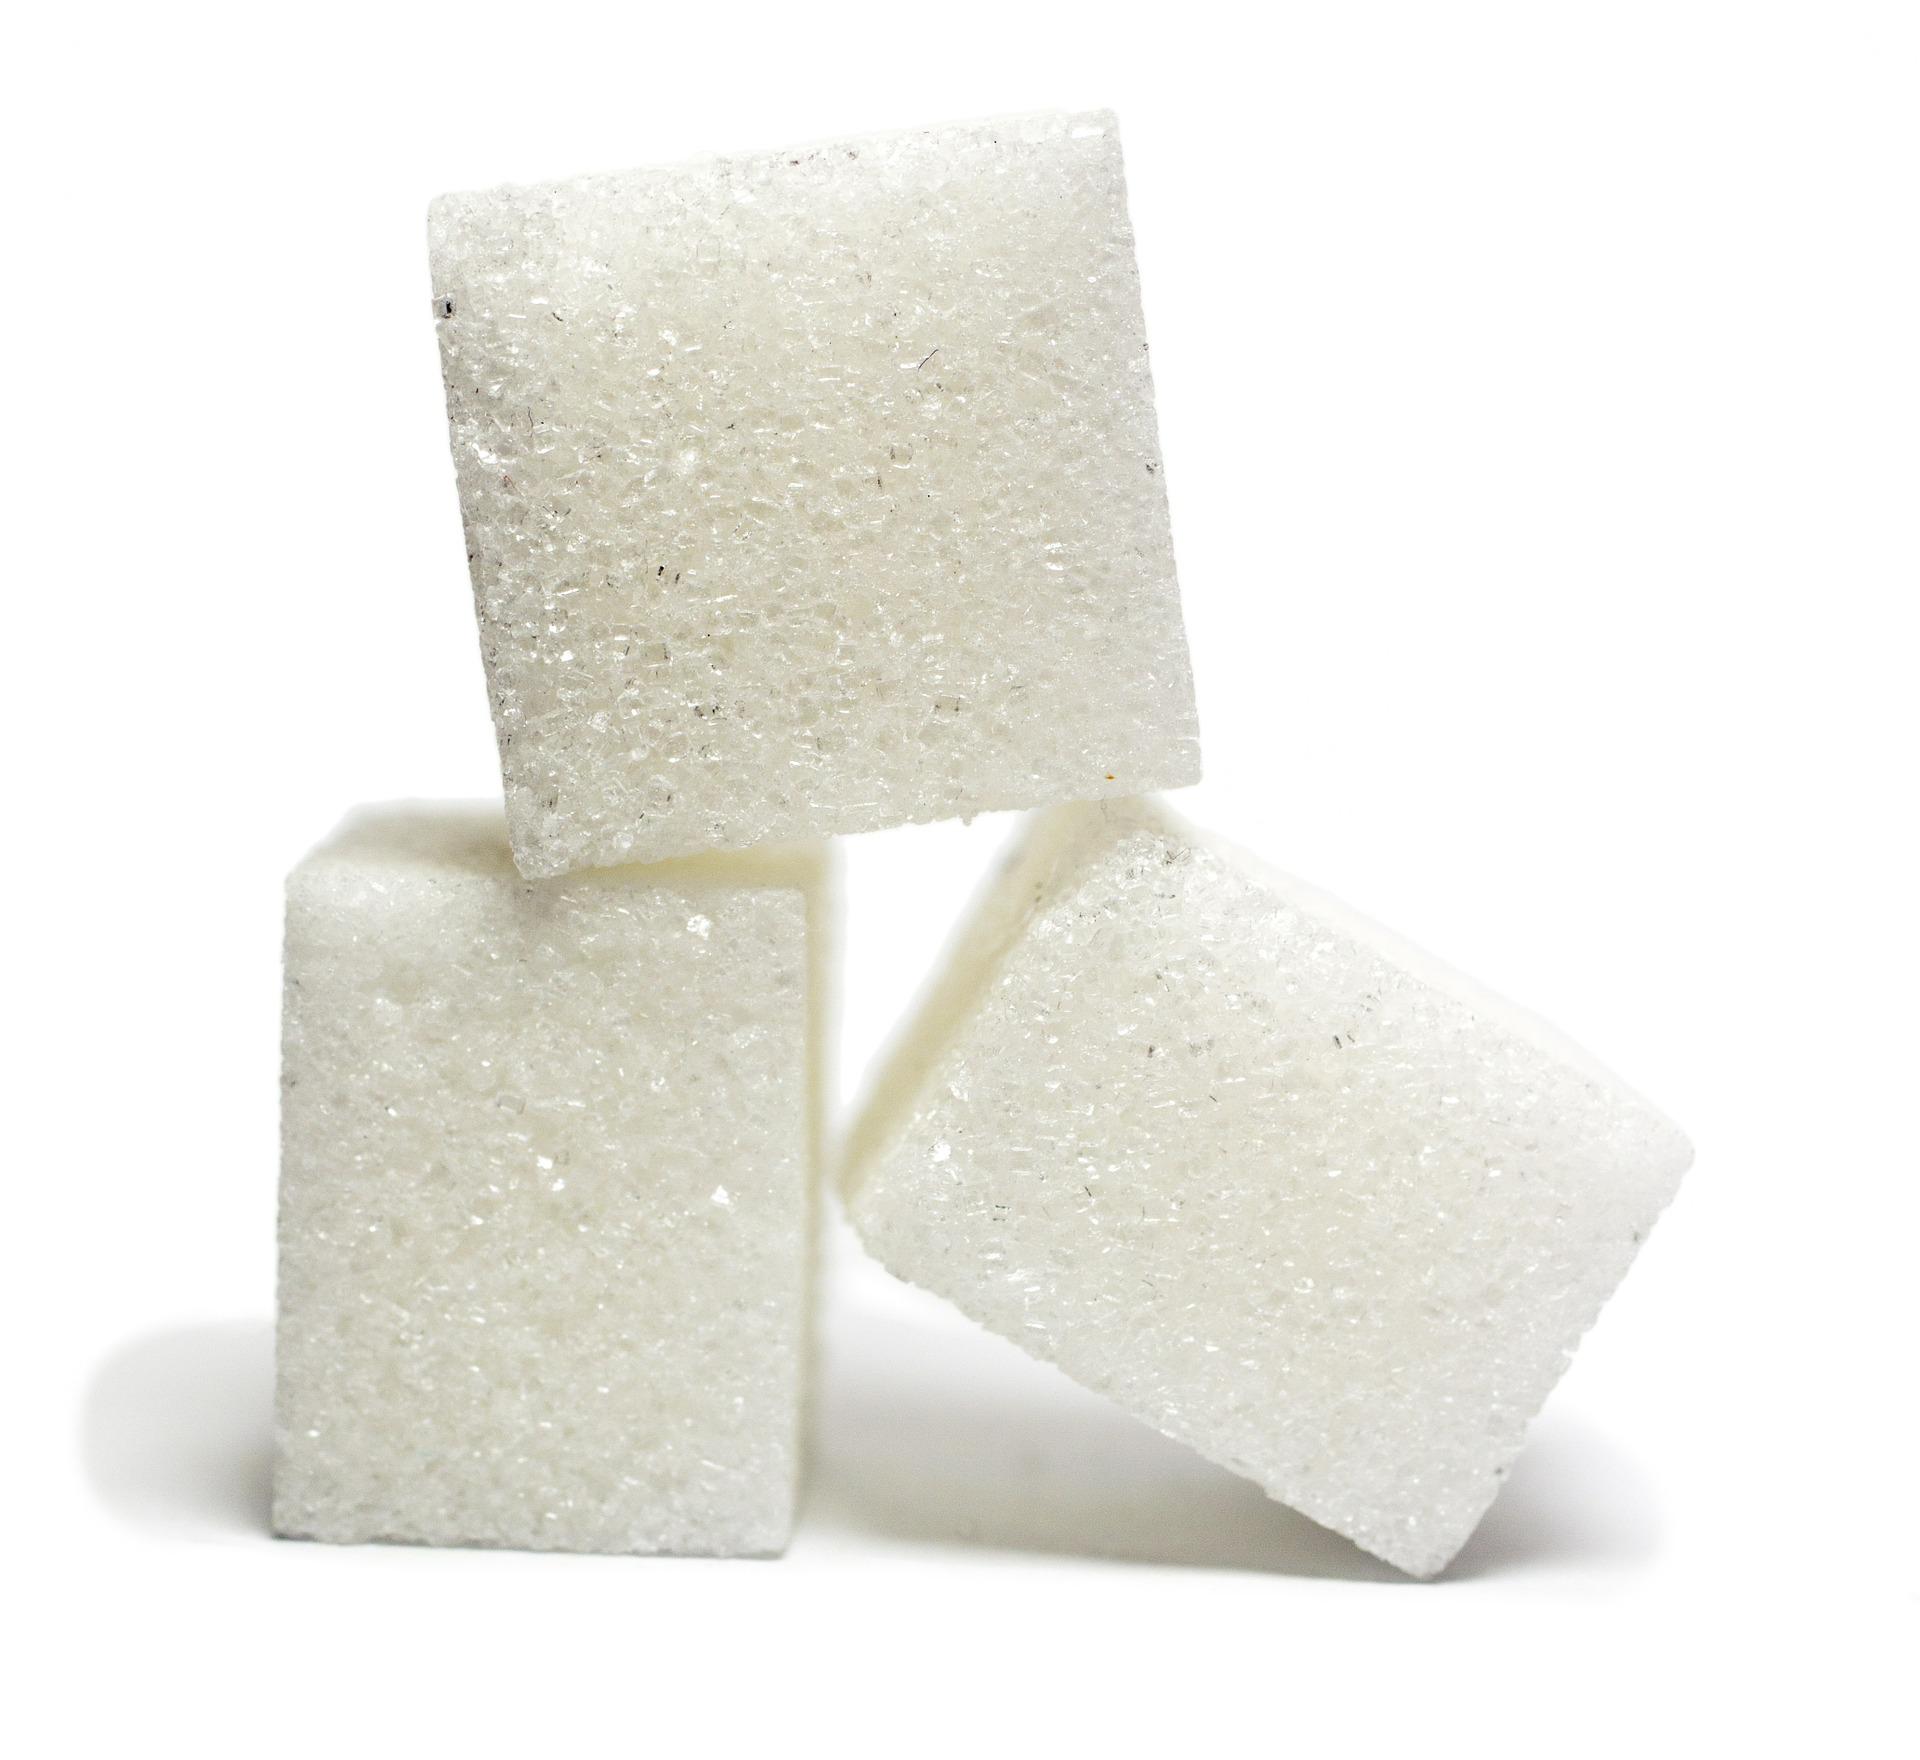 O grande vilão: Açúcar